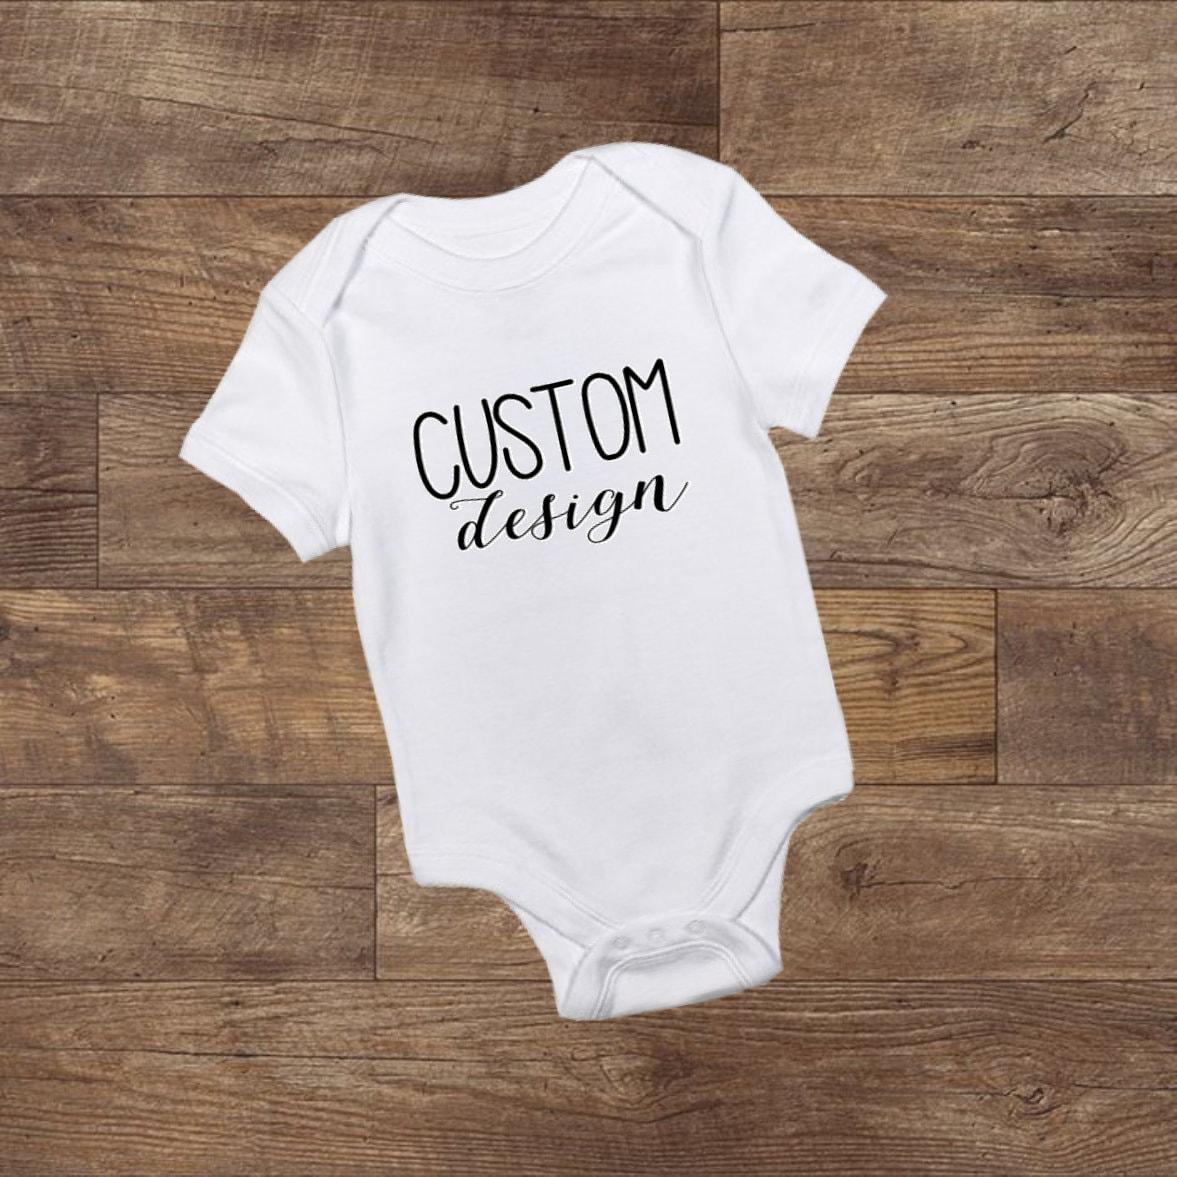 fb3016b7e Custom Baby Bodysuit Design Your Own Bodysuit Personalized | Etsy